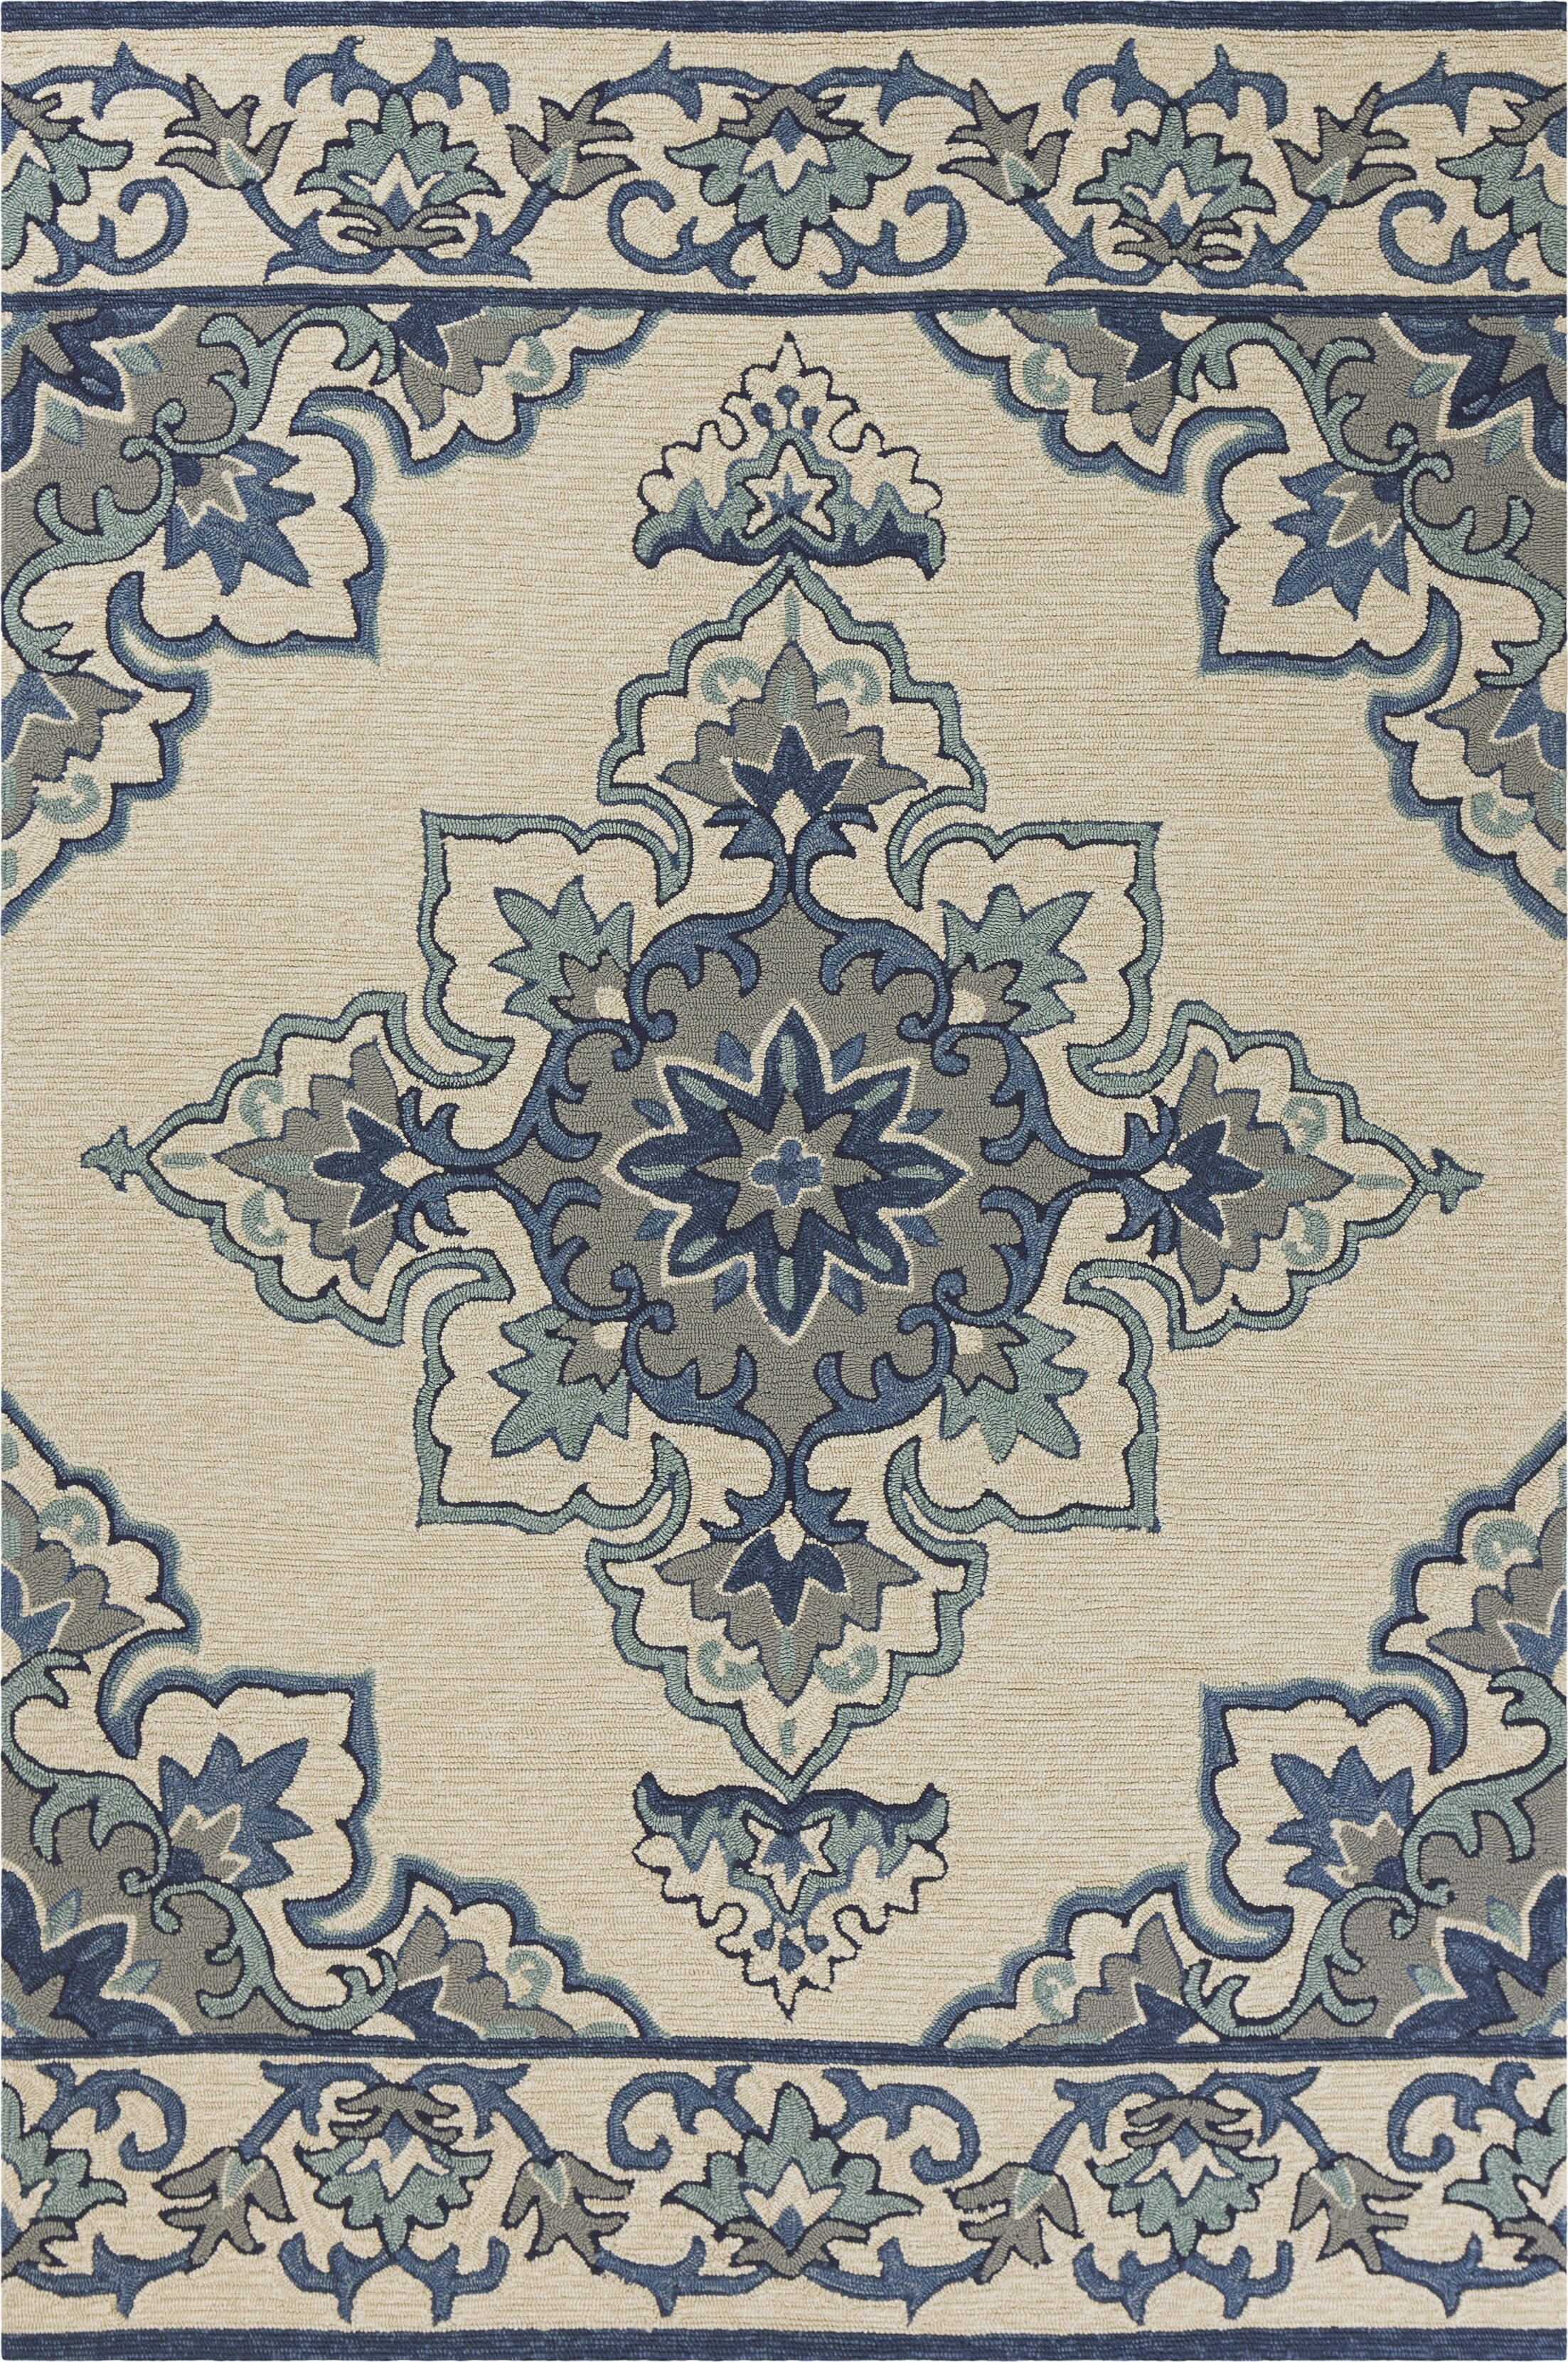 Edinburgh Hand-Woven Ivory/Blue Indoor/Outdoor Area Rug Rug Size: Rectangle 7'6